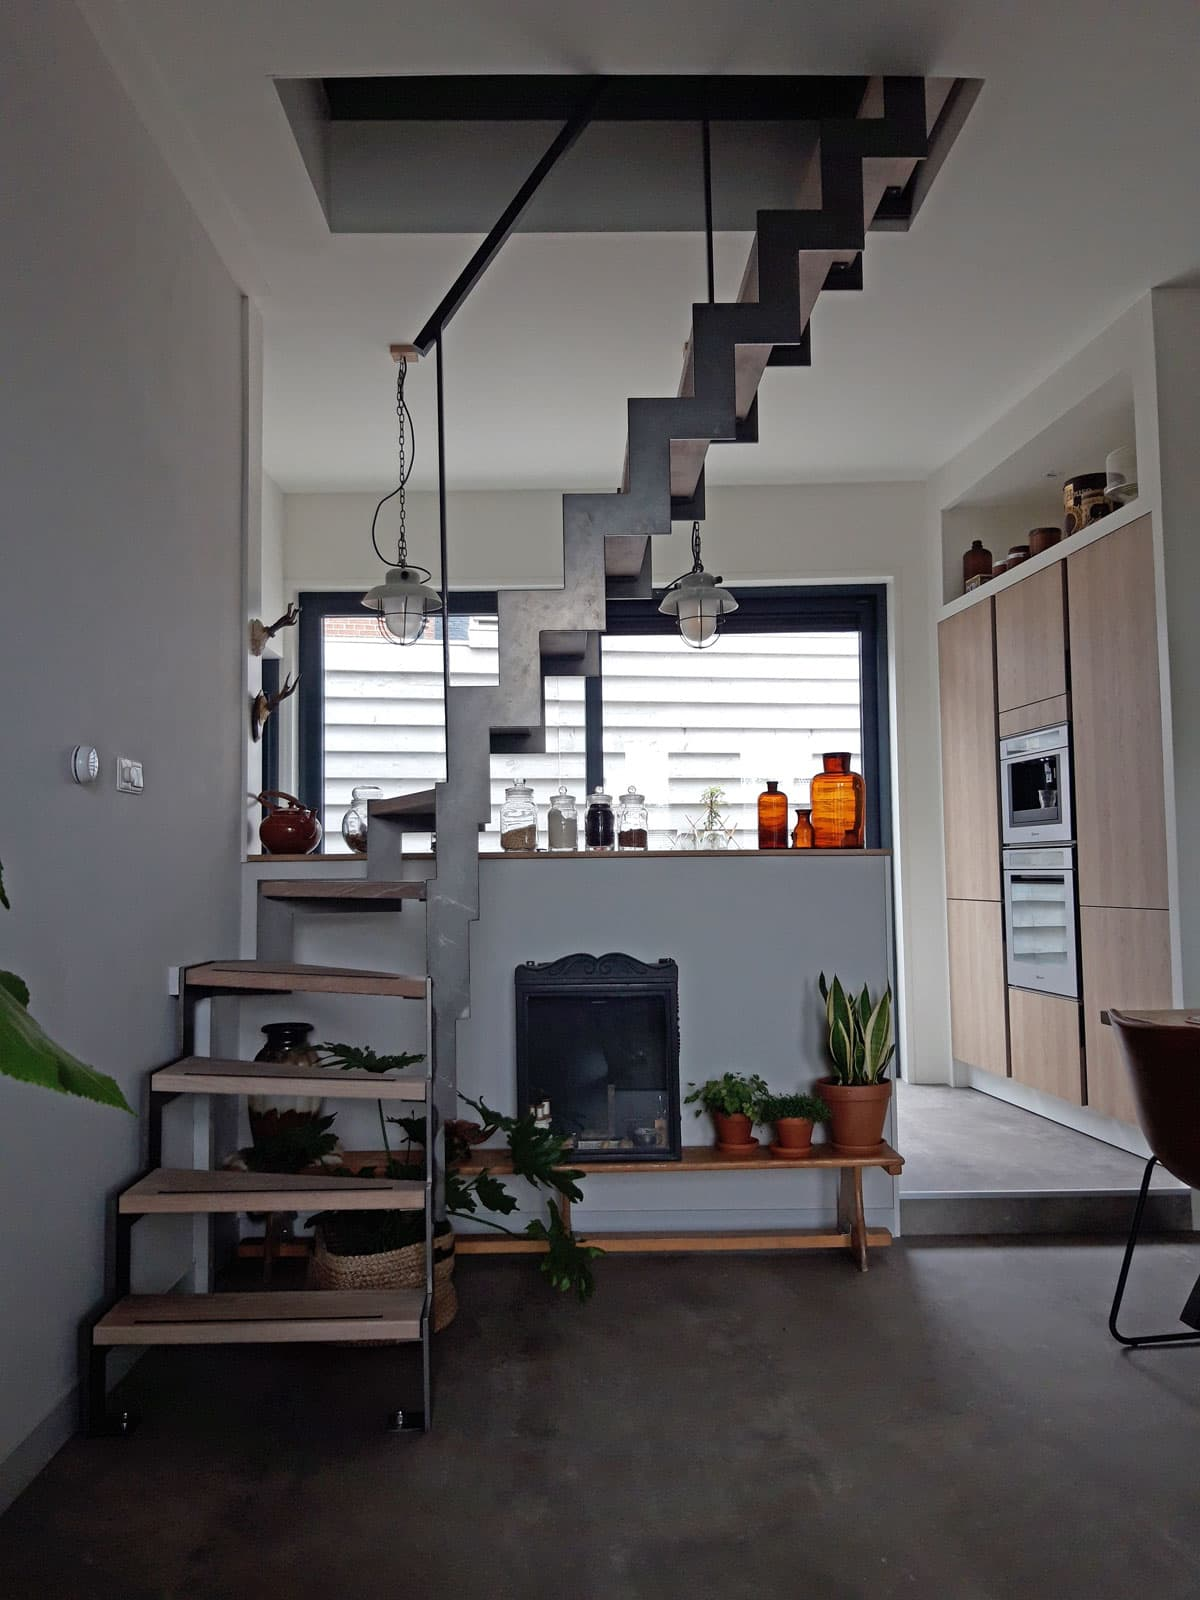 mut40a muizeboomtrap met onderkwart woonkamer